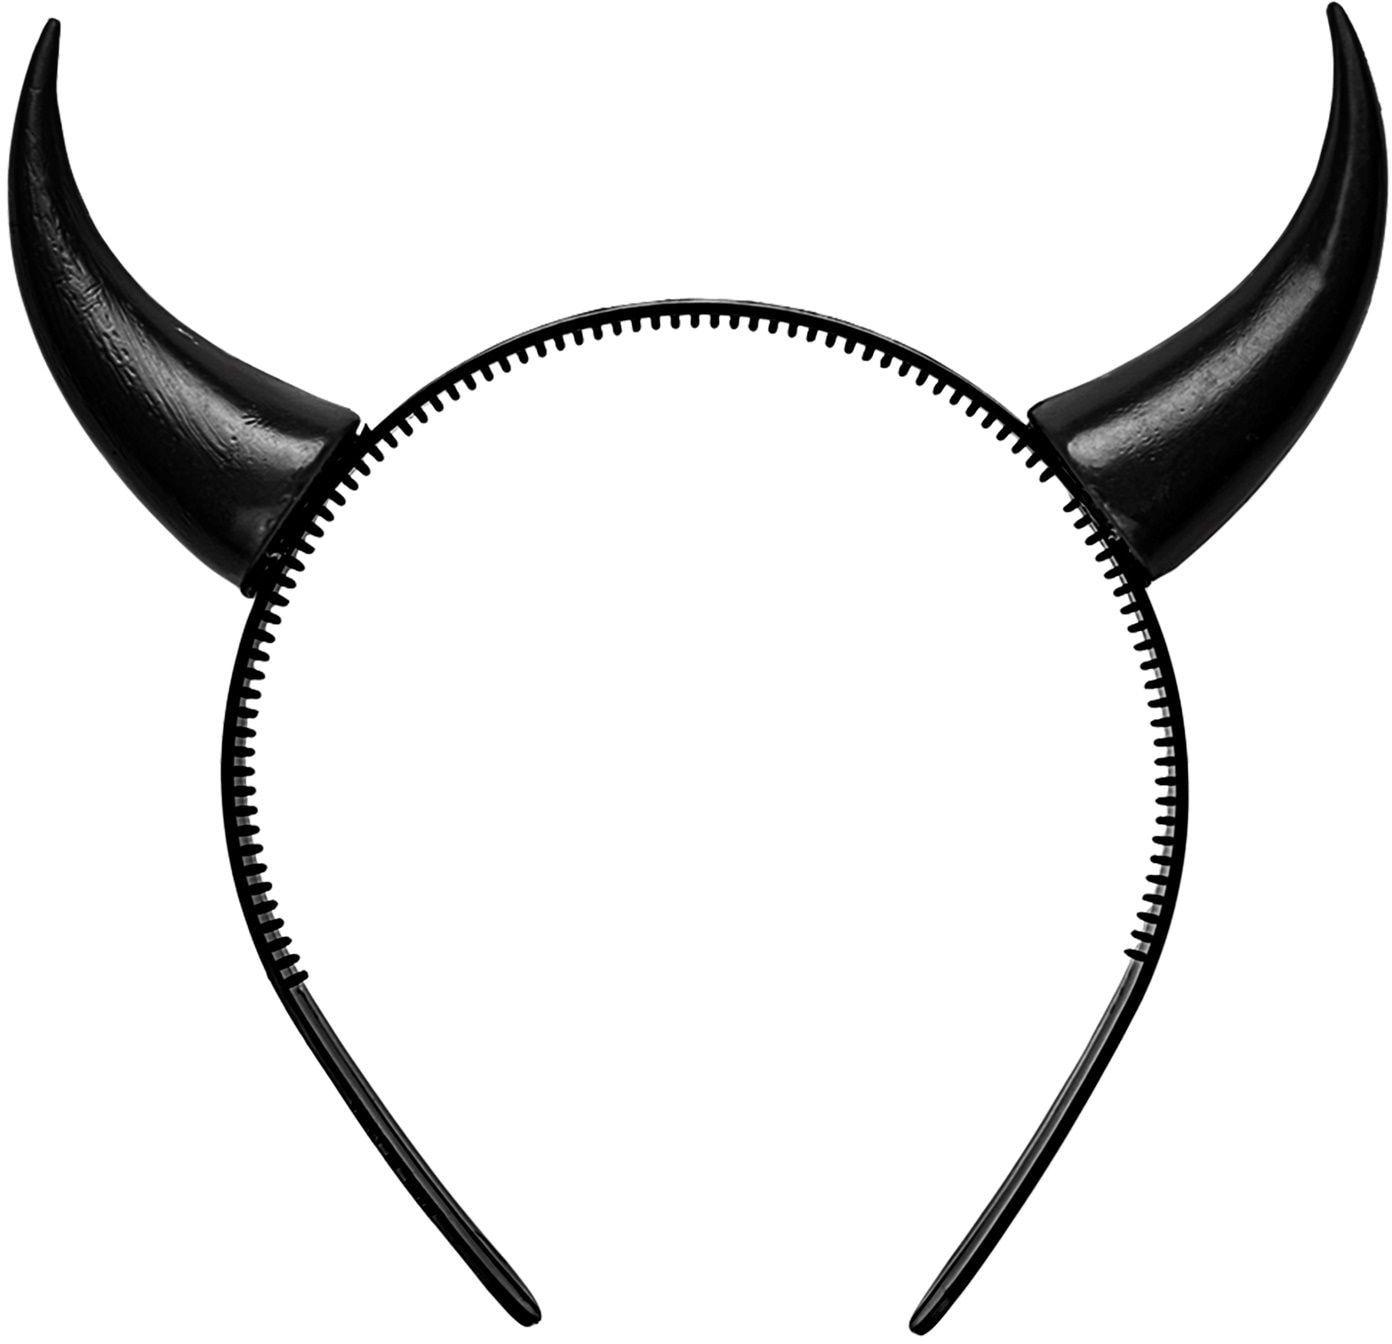 Zwarte duivel hoorntjes